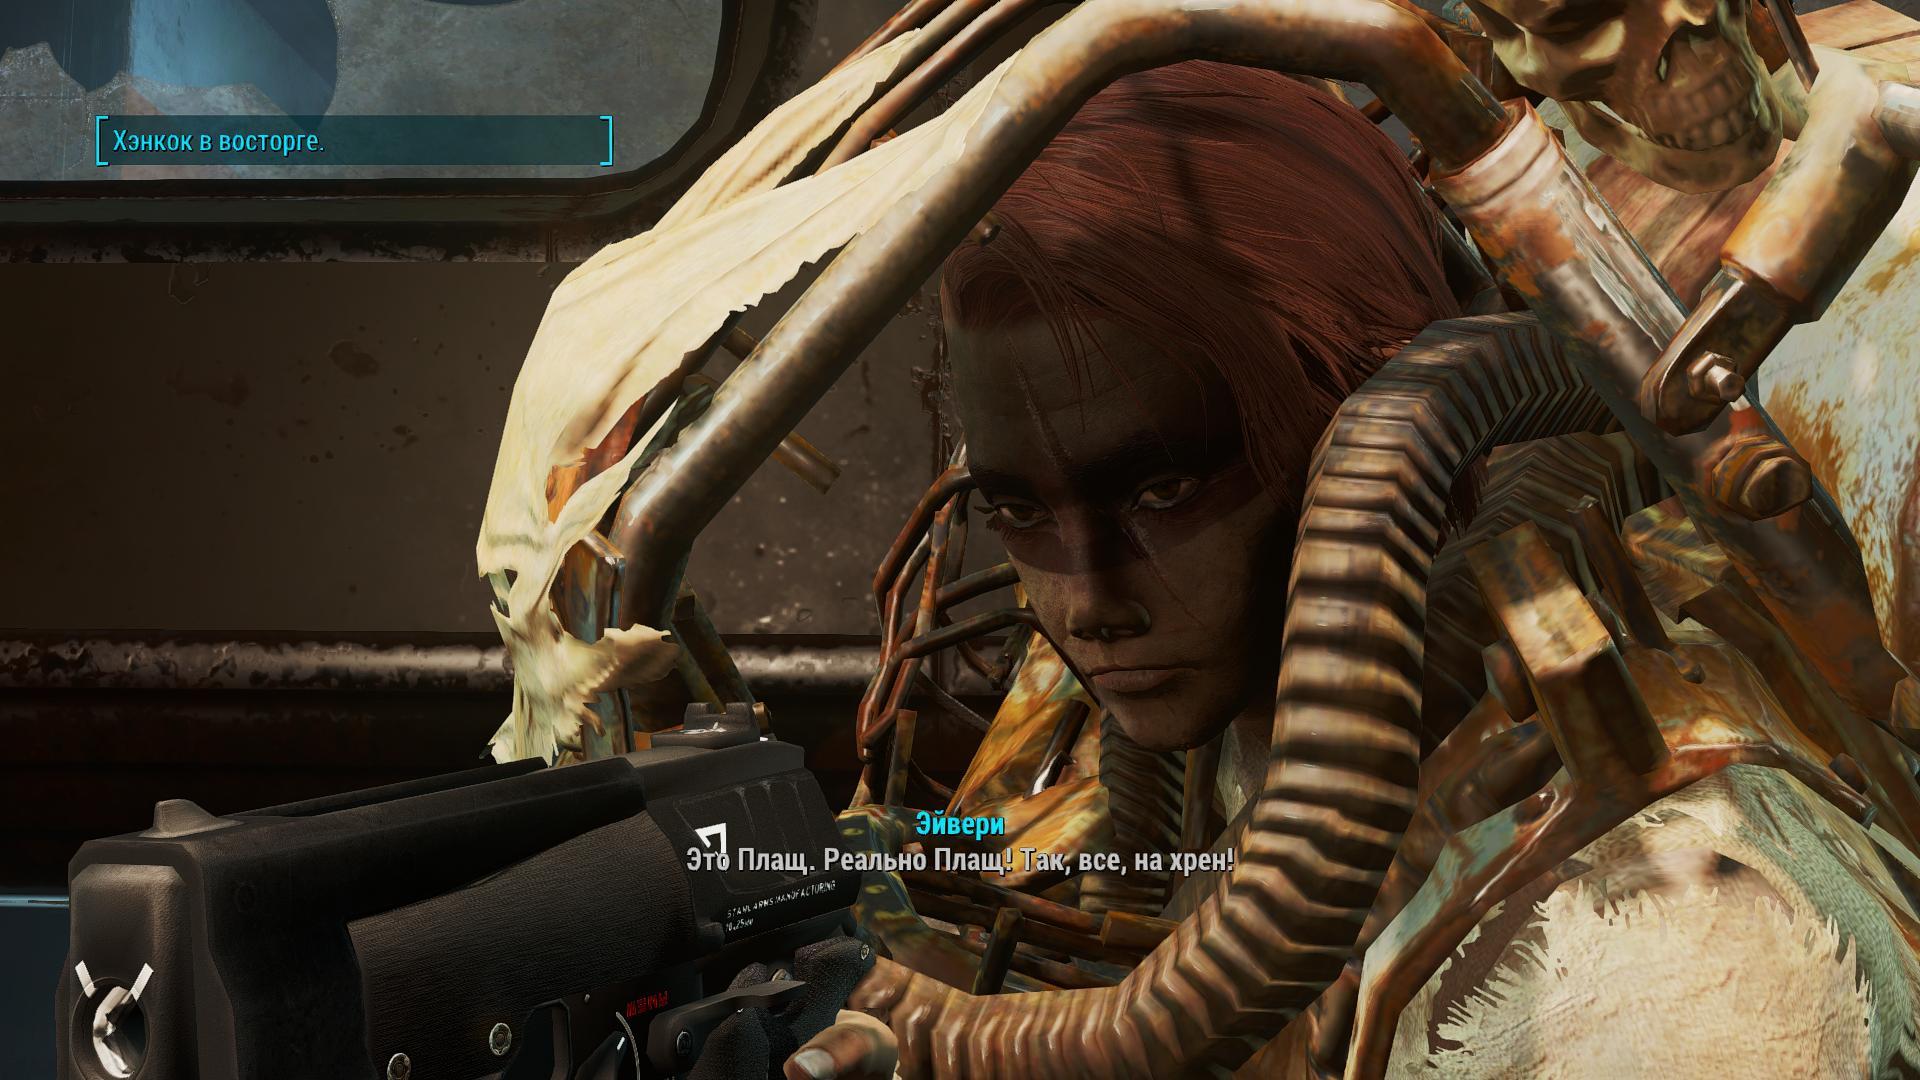 000526.Jpg - Fallout 4